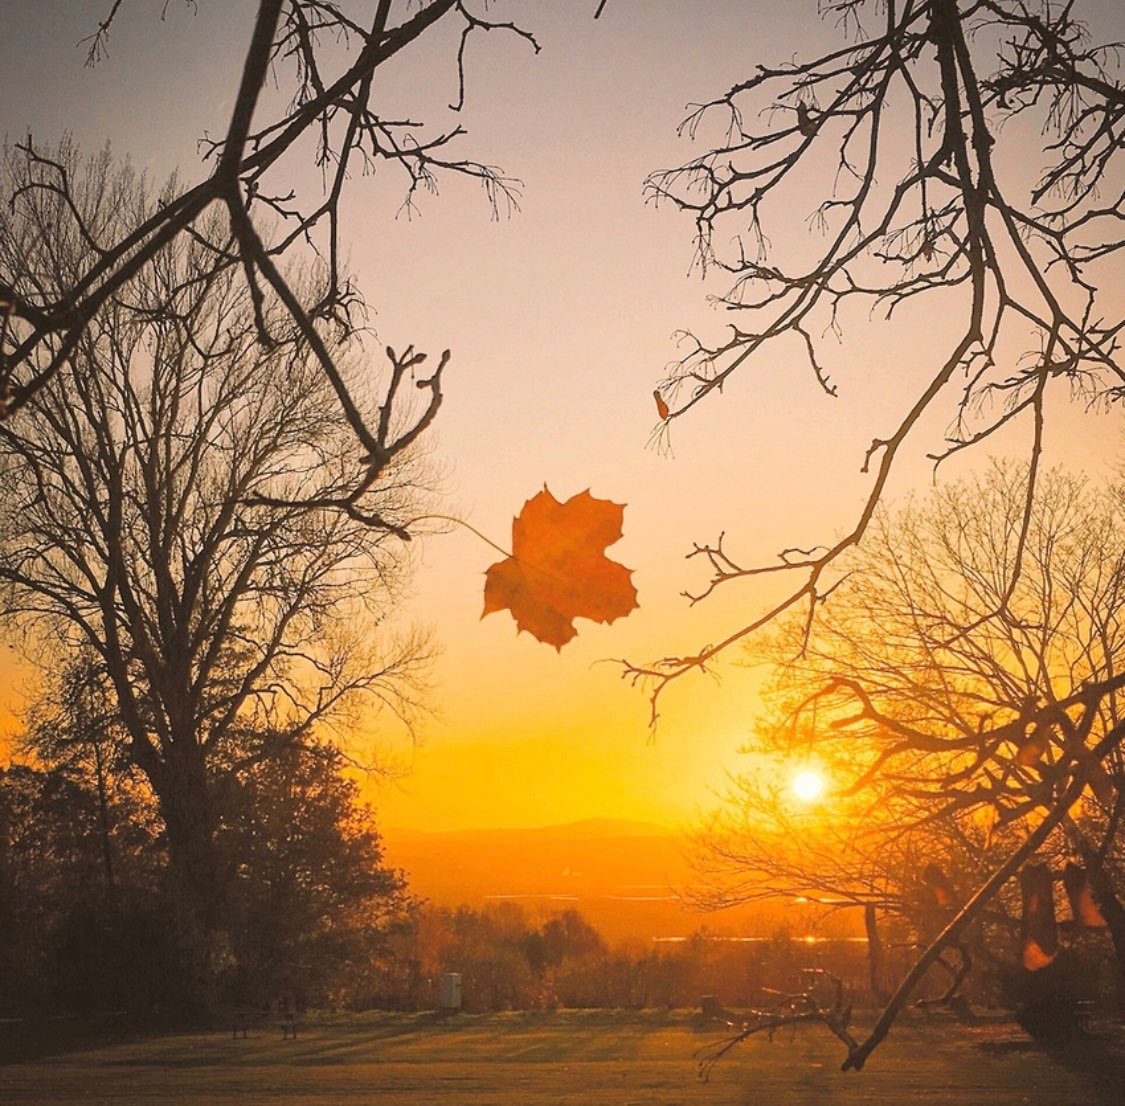 Hanging On (Ness Botanic Gardens) - Luke Neale.jpg